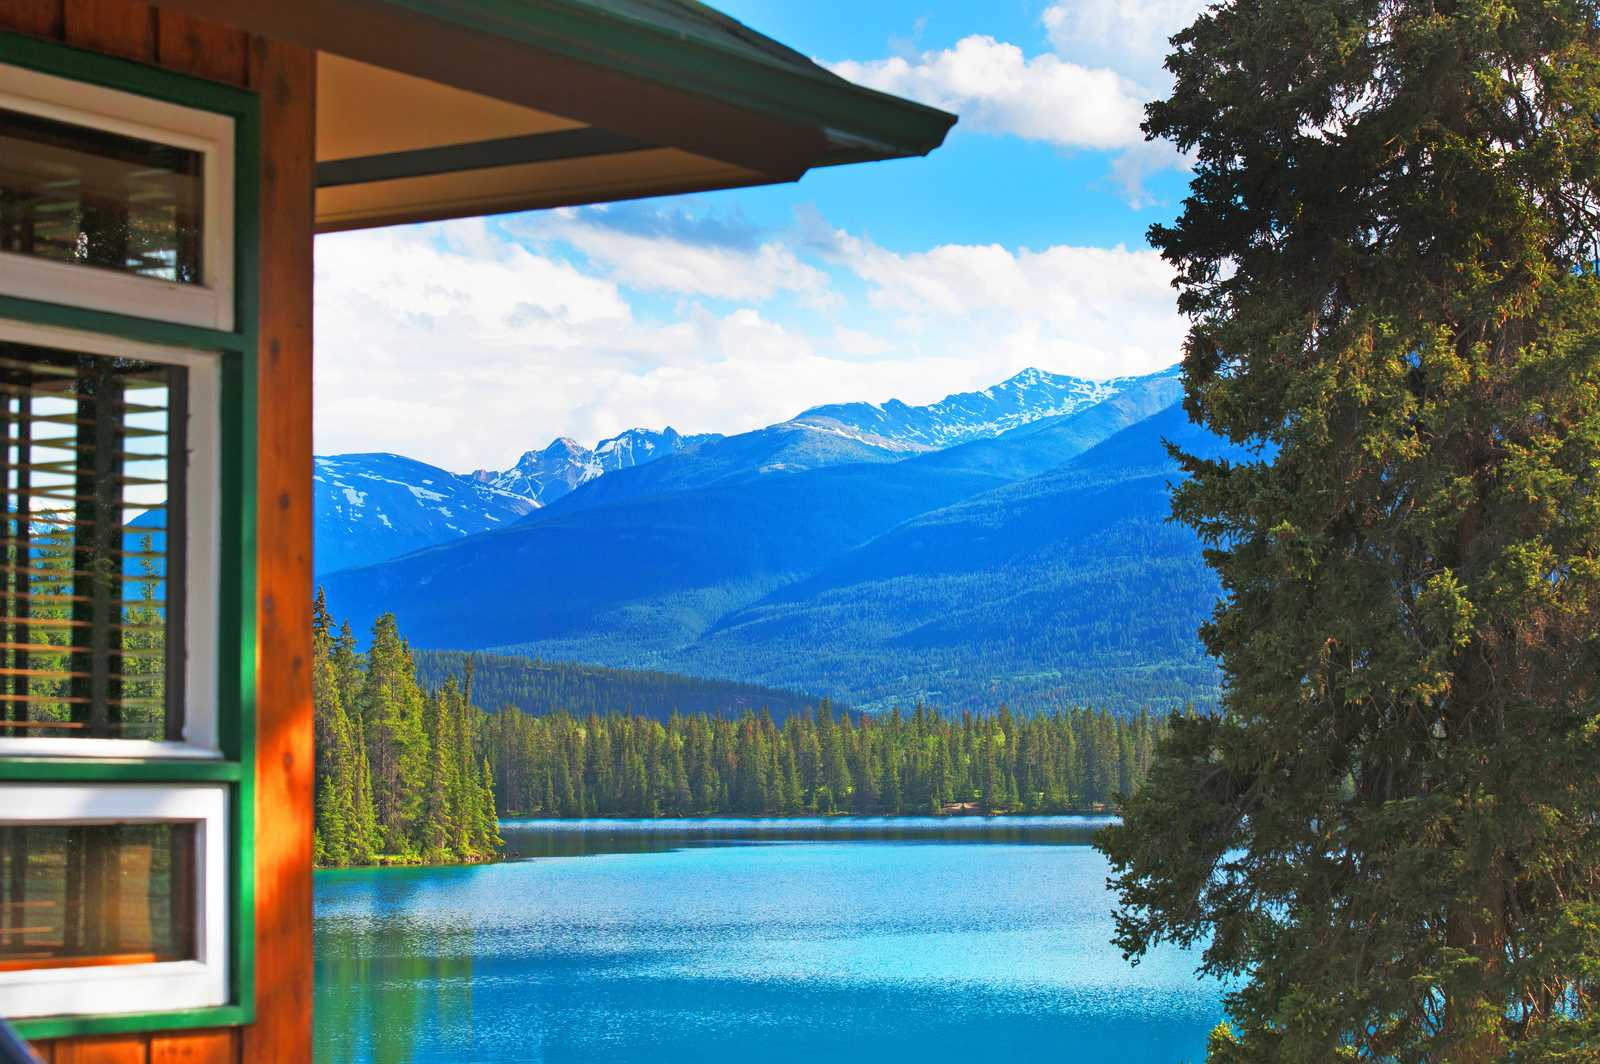 Blick auf den Lac Beauvert